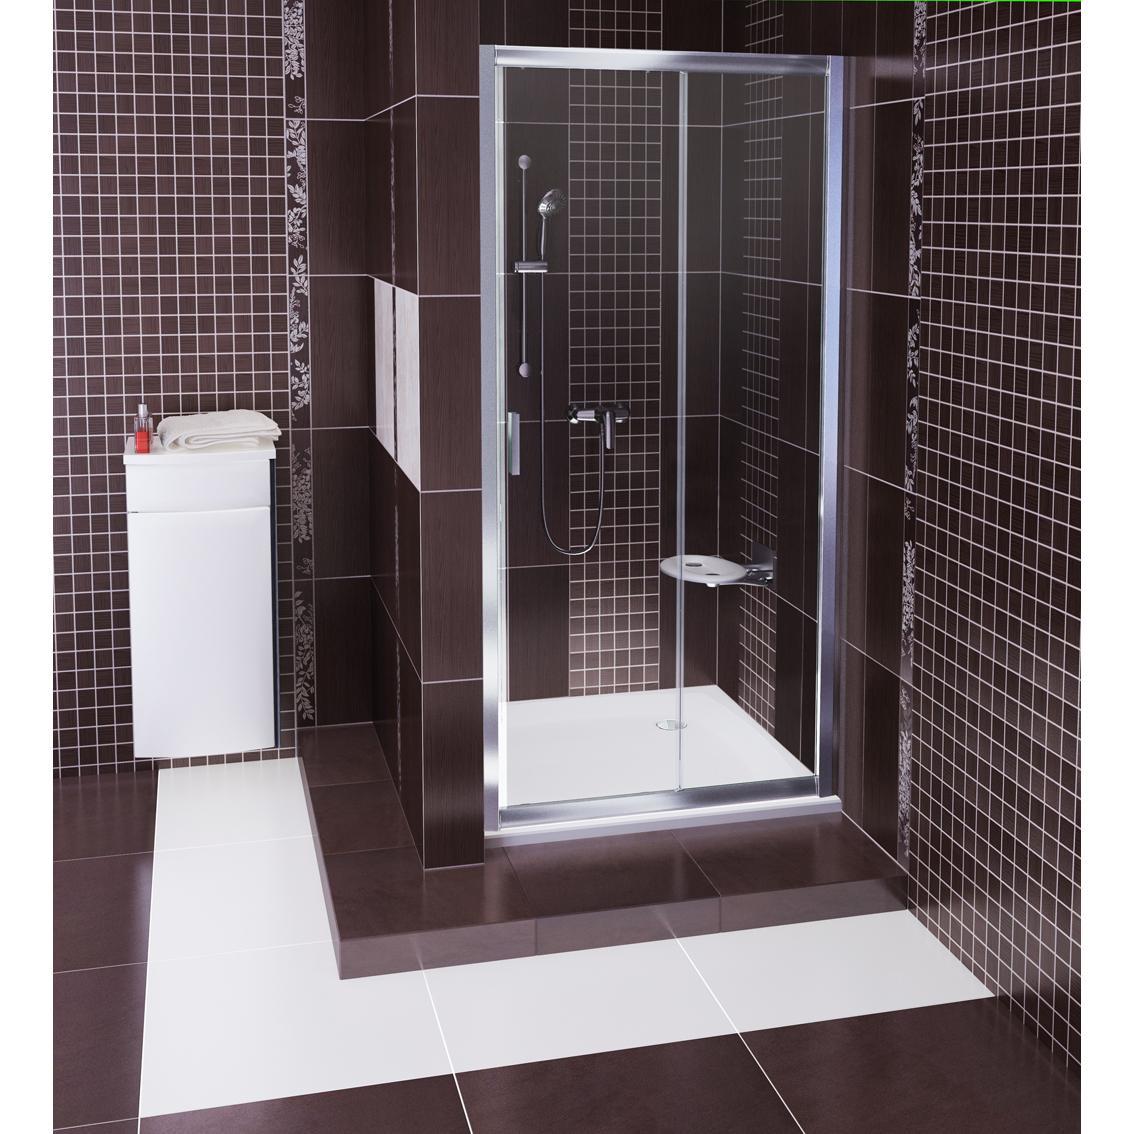 лучшая цена Душевая дверь Ravak BLDP2 110 белый+Транспарент